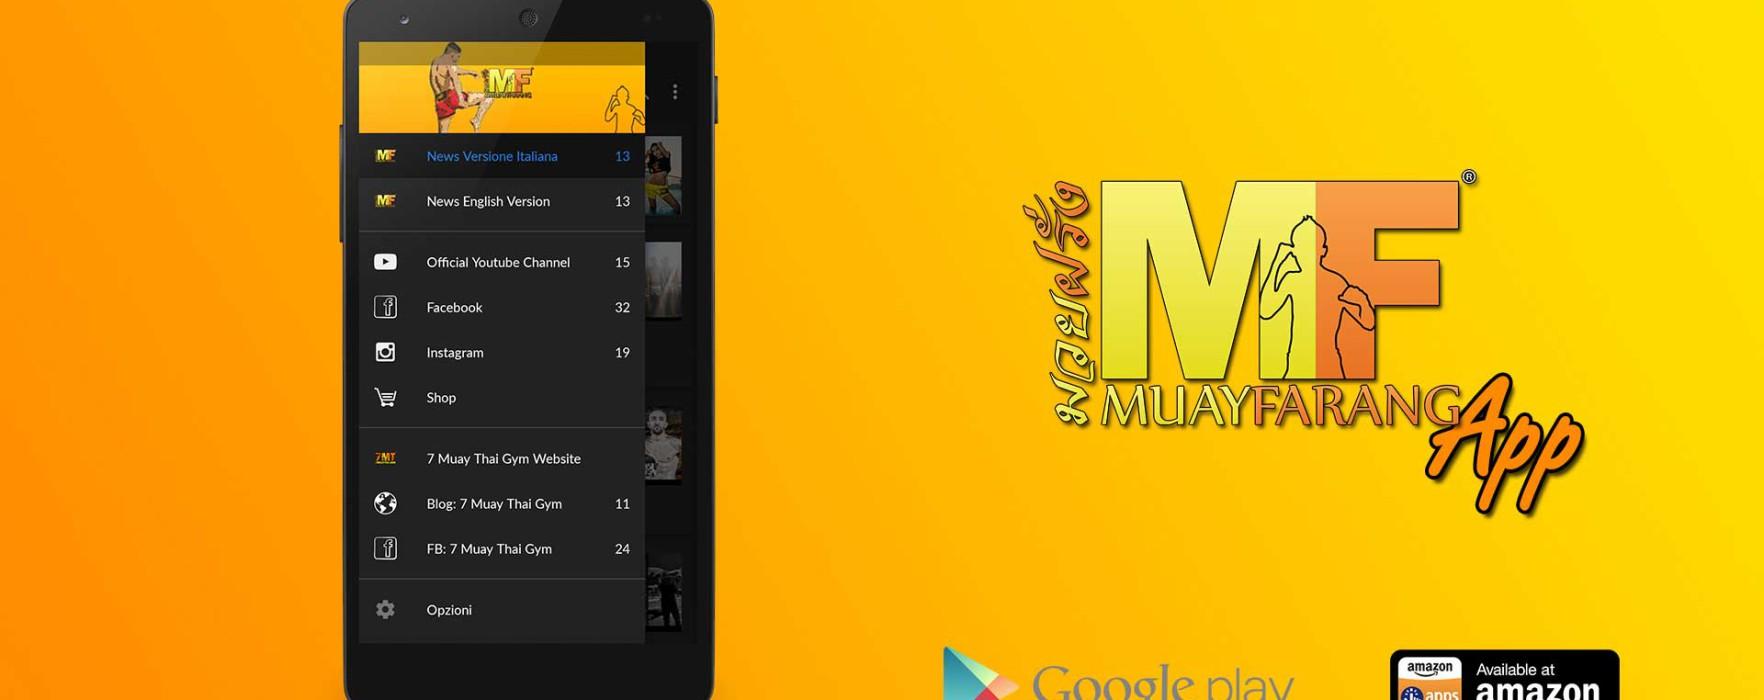 Muay Farang App (Free)